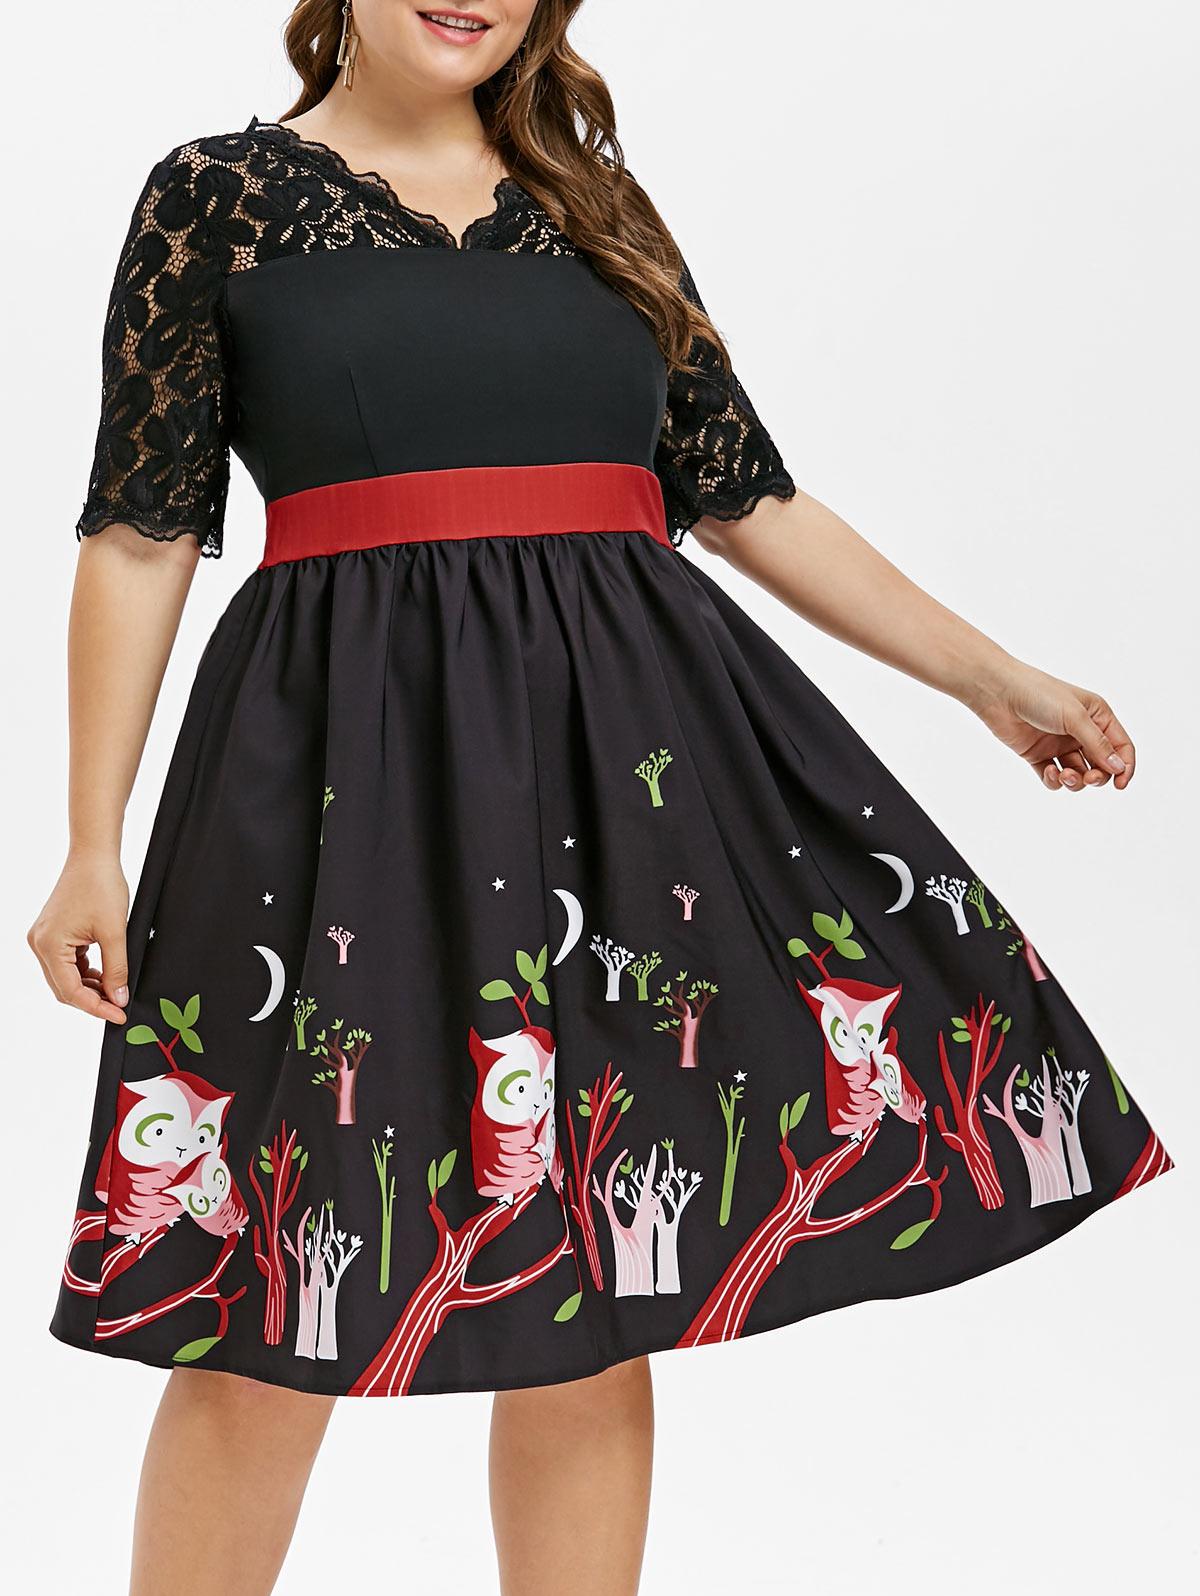 487ed2e33269b Wipalo Women Retro Dress Owl Printed V-Neck Vintage Dress Plus Size Lace  Yoke Half Sleeves A-Line Party Dresses Femme Vestidos